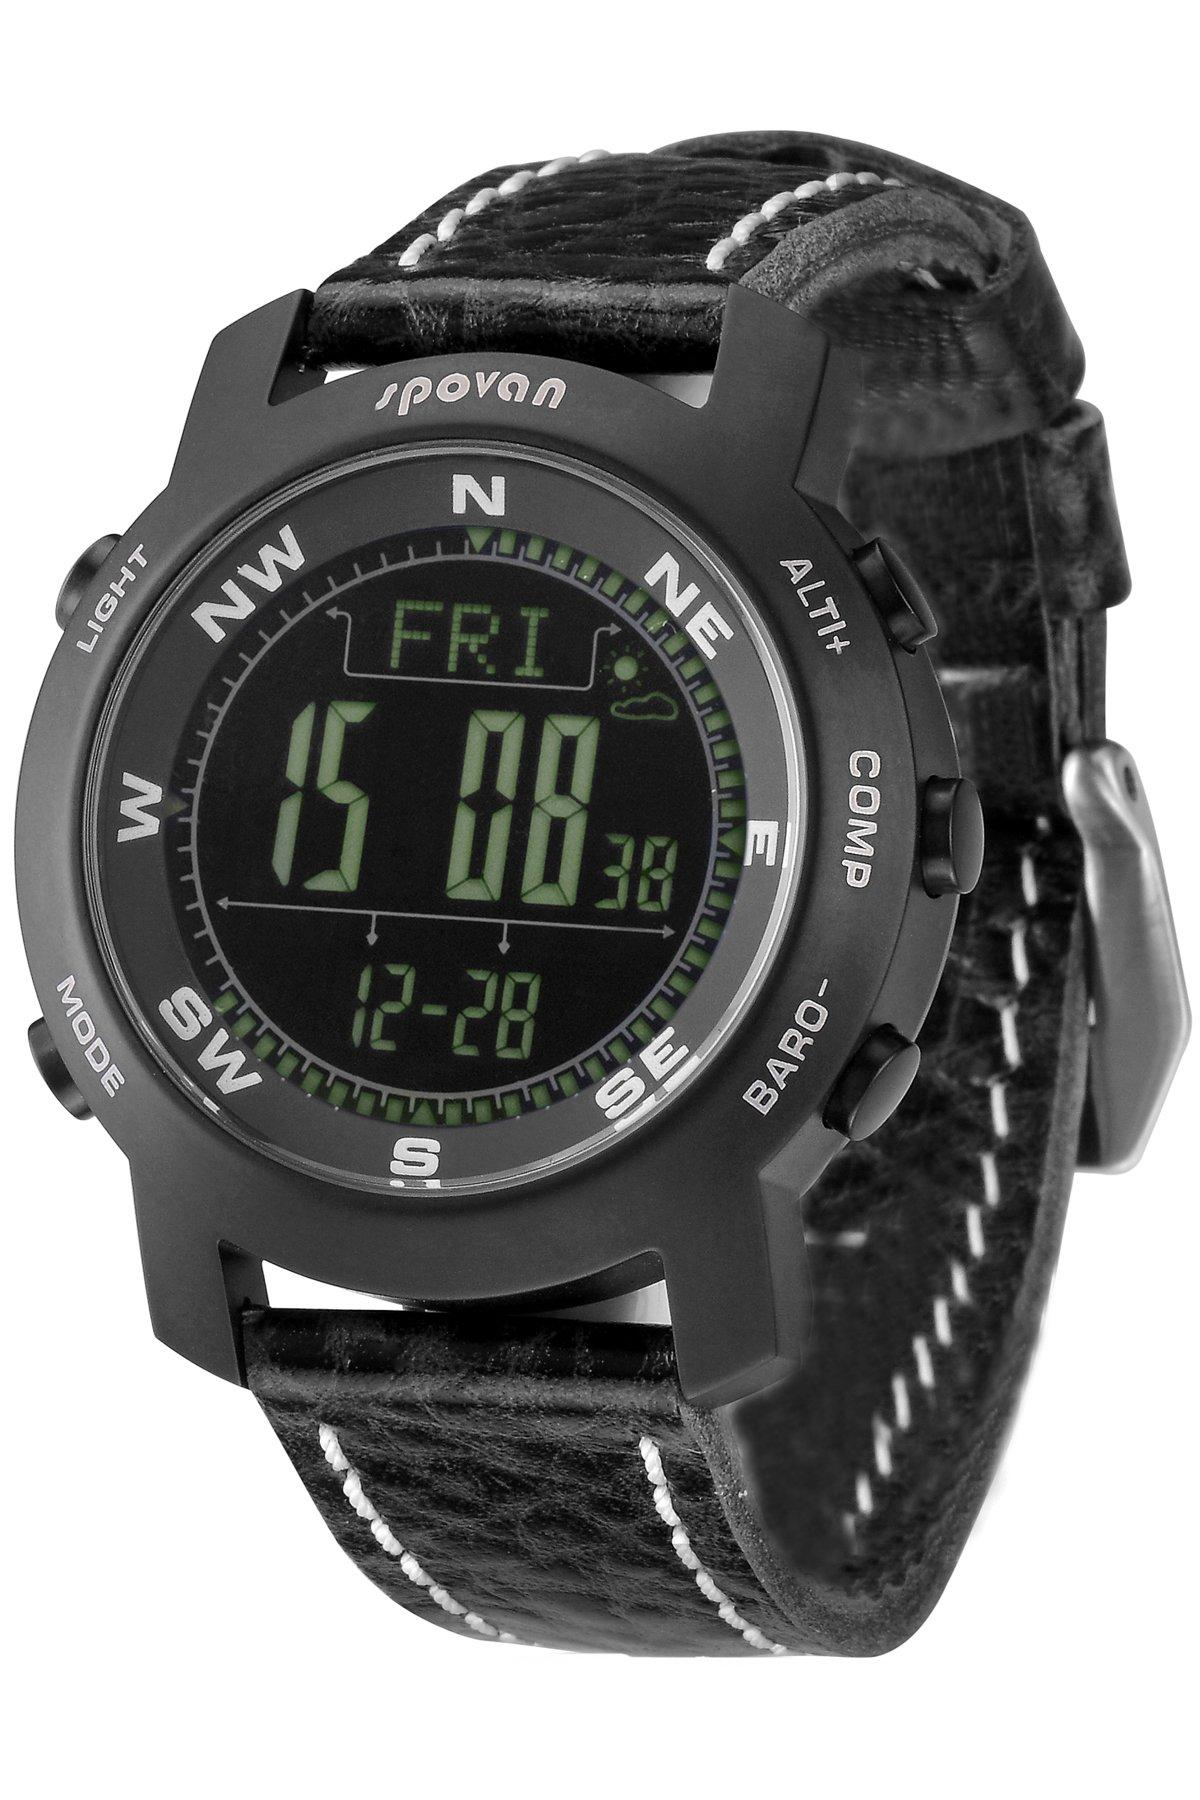 Spovan Mens Altimeter Barometer Compass Black Titanium Sapphire Digital Watches